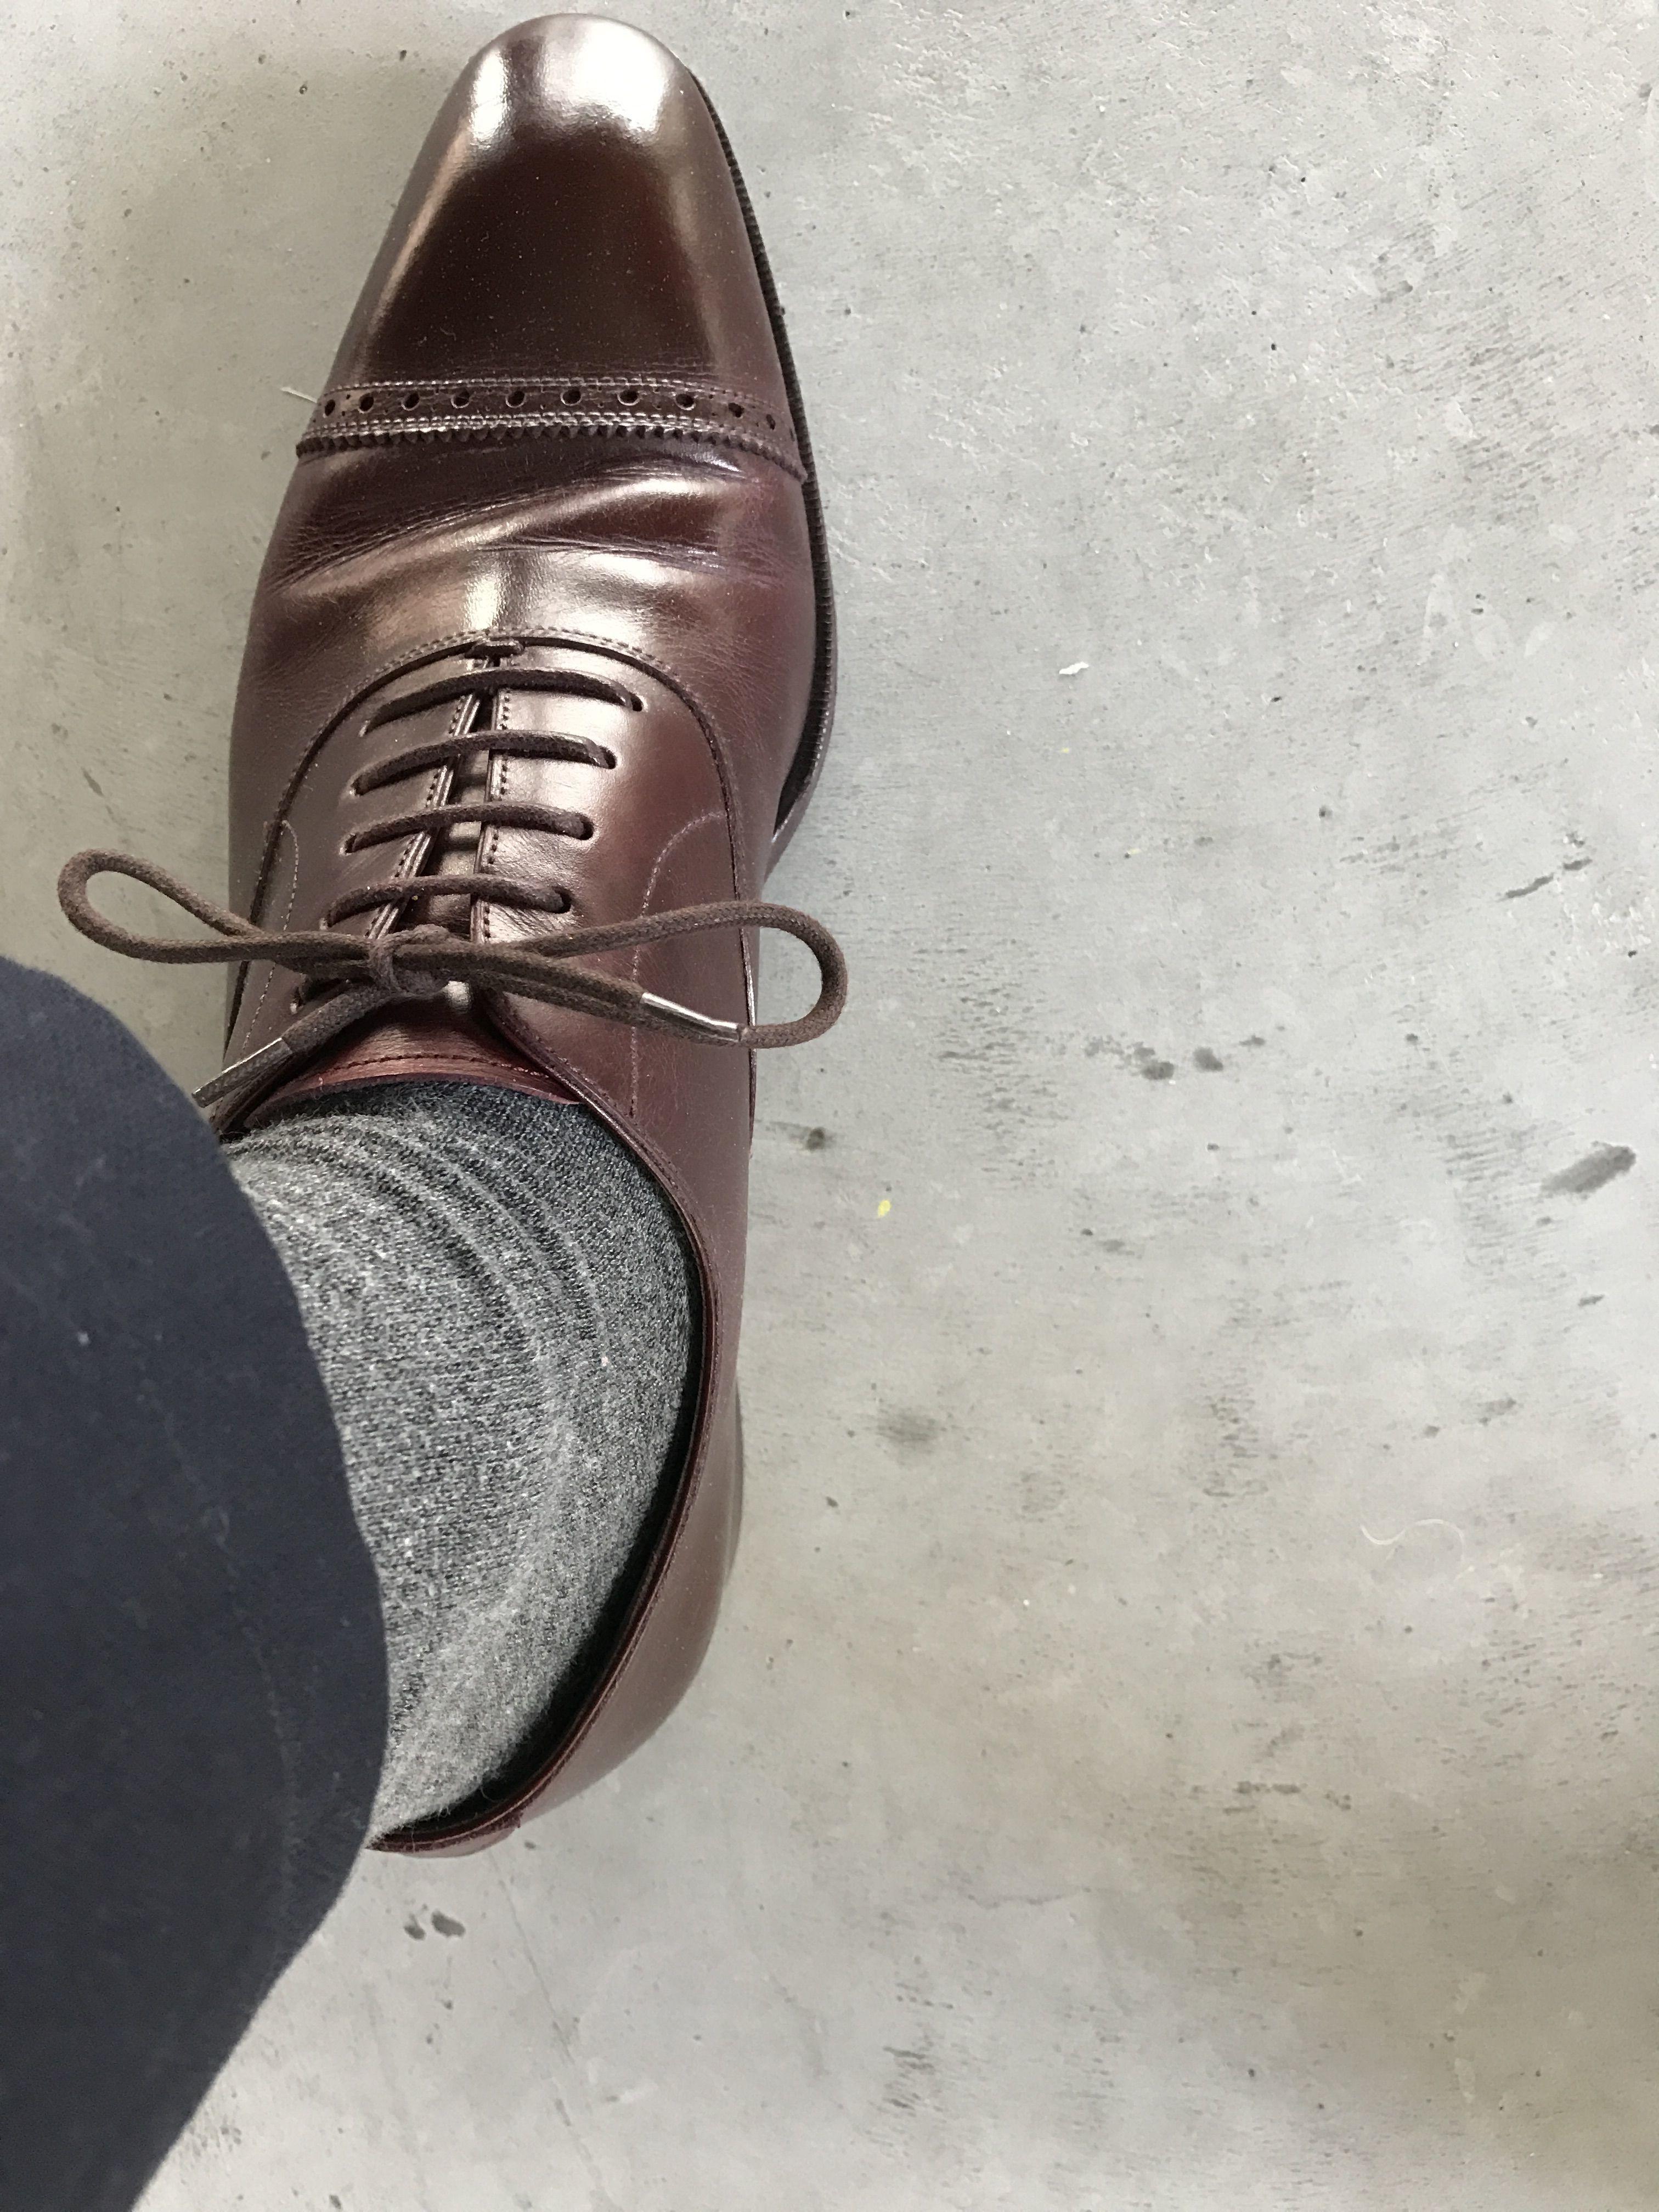 b5c2f48922c Carmina Shoes - Definitive Thread (reviews, advice, sizing, etc ...